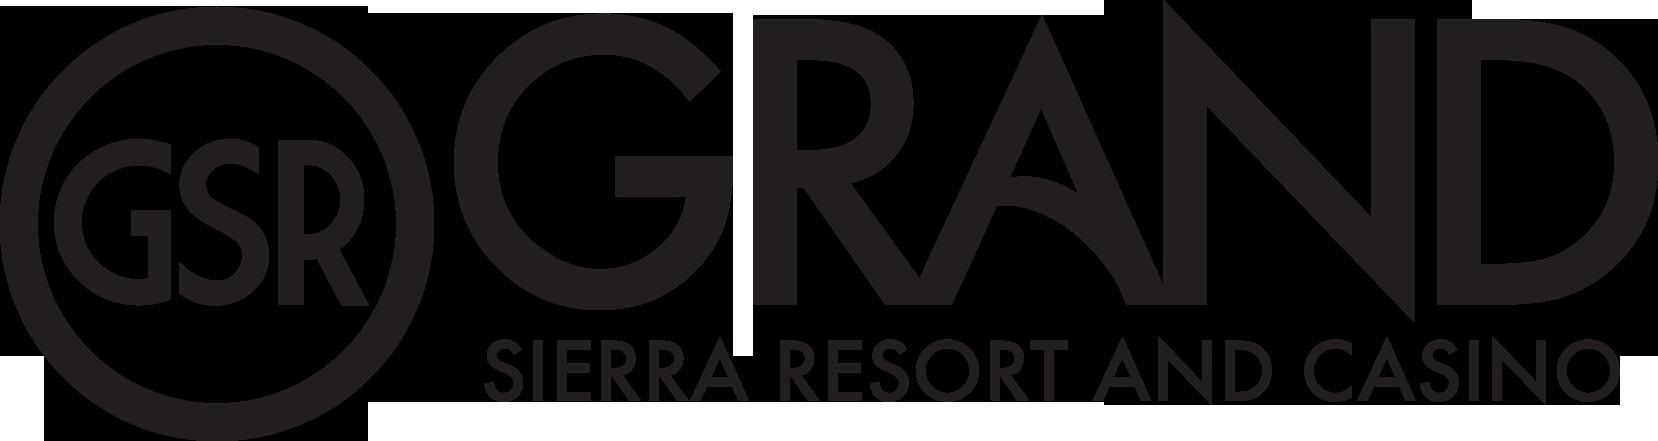 filegrand sierra resort logo blackpng wikimedia commons